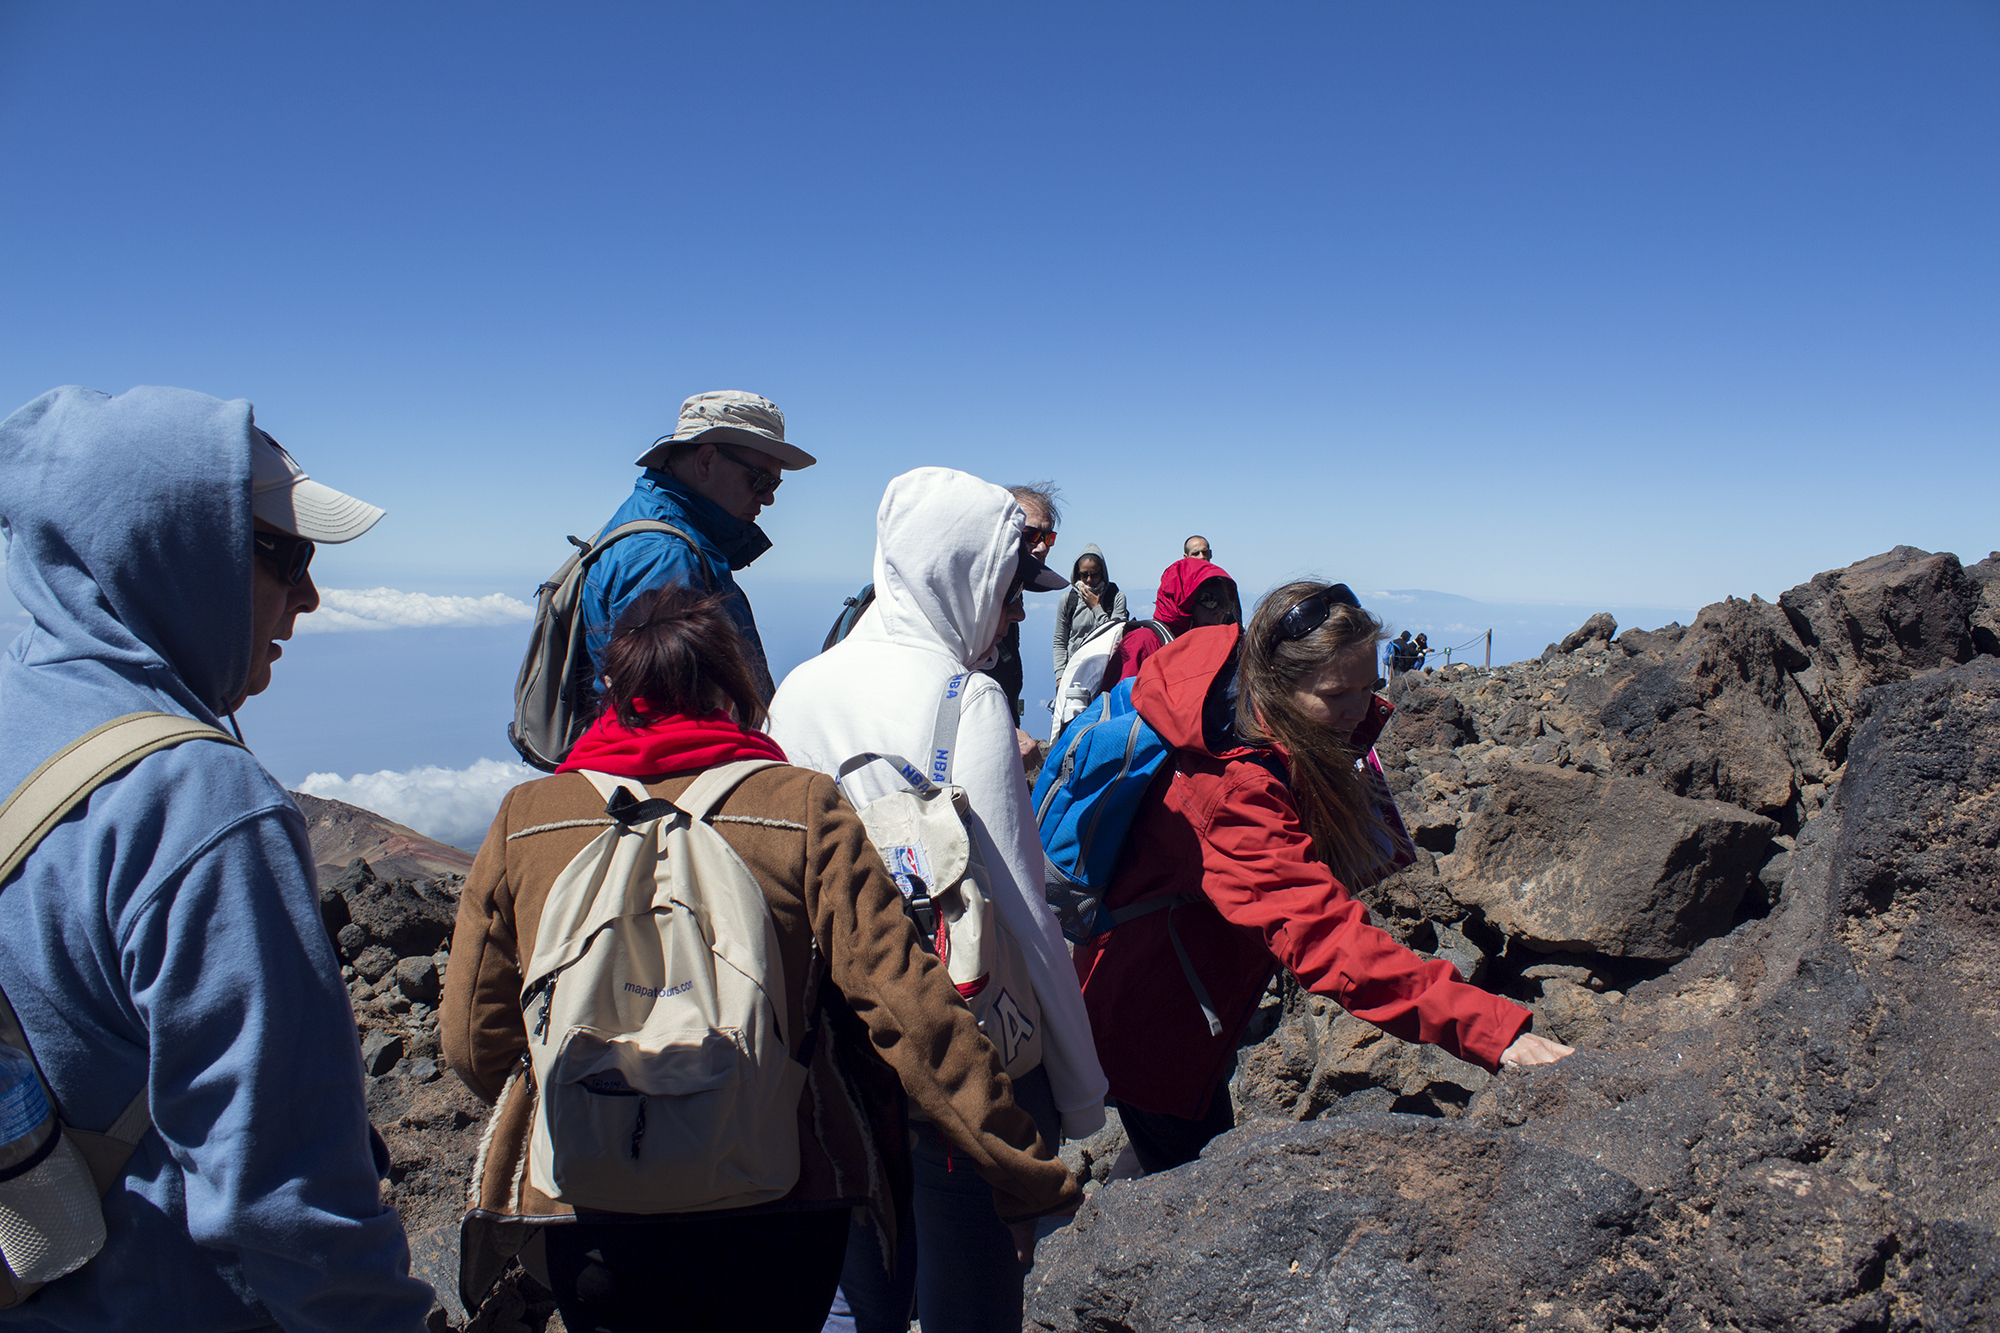 Salire sul Teide senza permesso: Pico Viejo